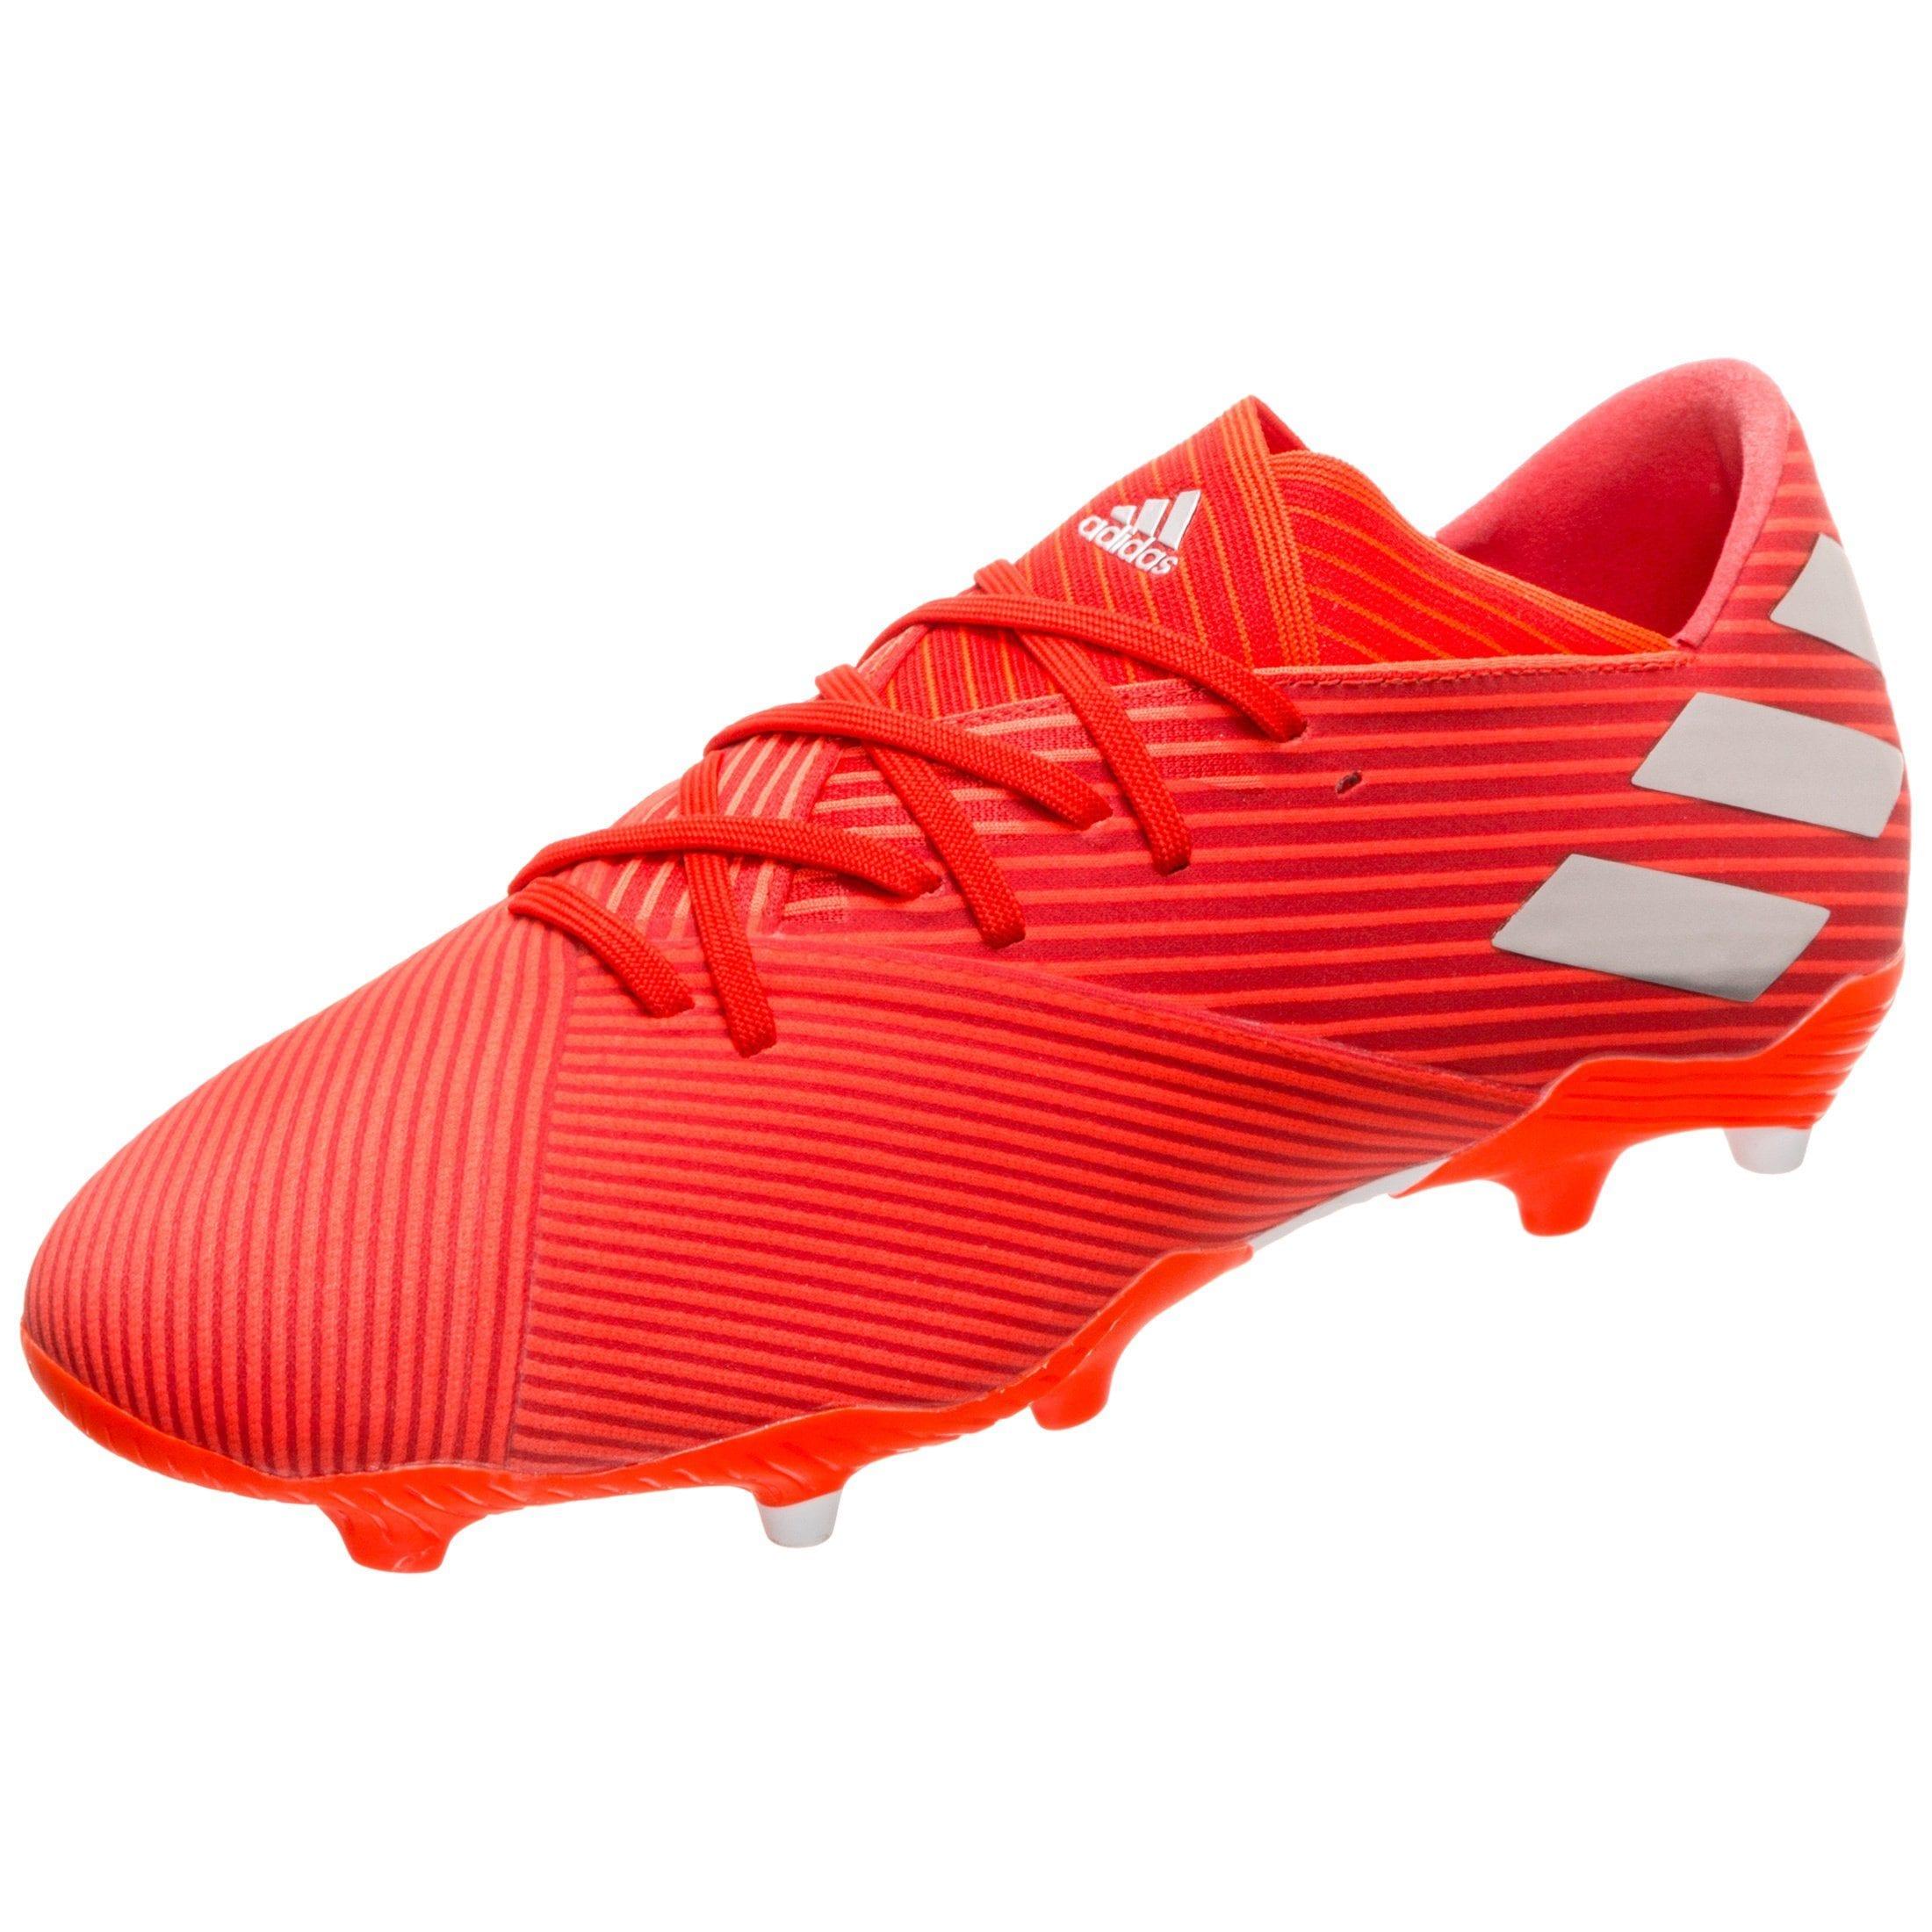 adidas Performance Fußballschuh Nemeziz 192 | Schuhe > Sportschuhe > Fußballschuhe | adidas performance